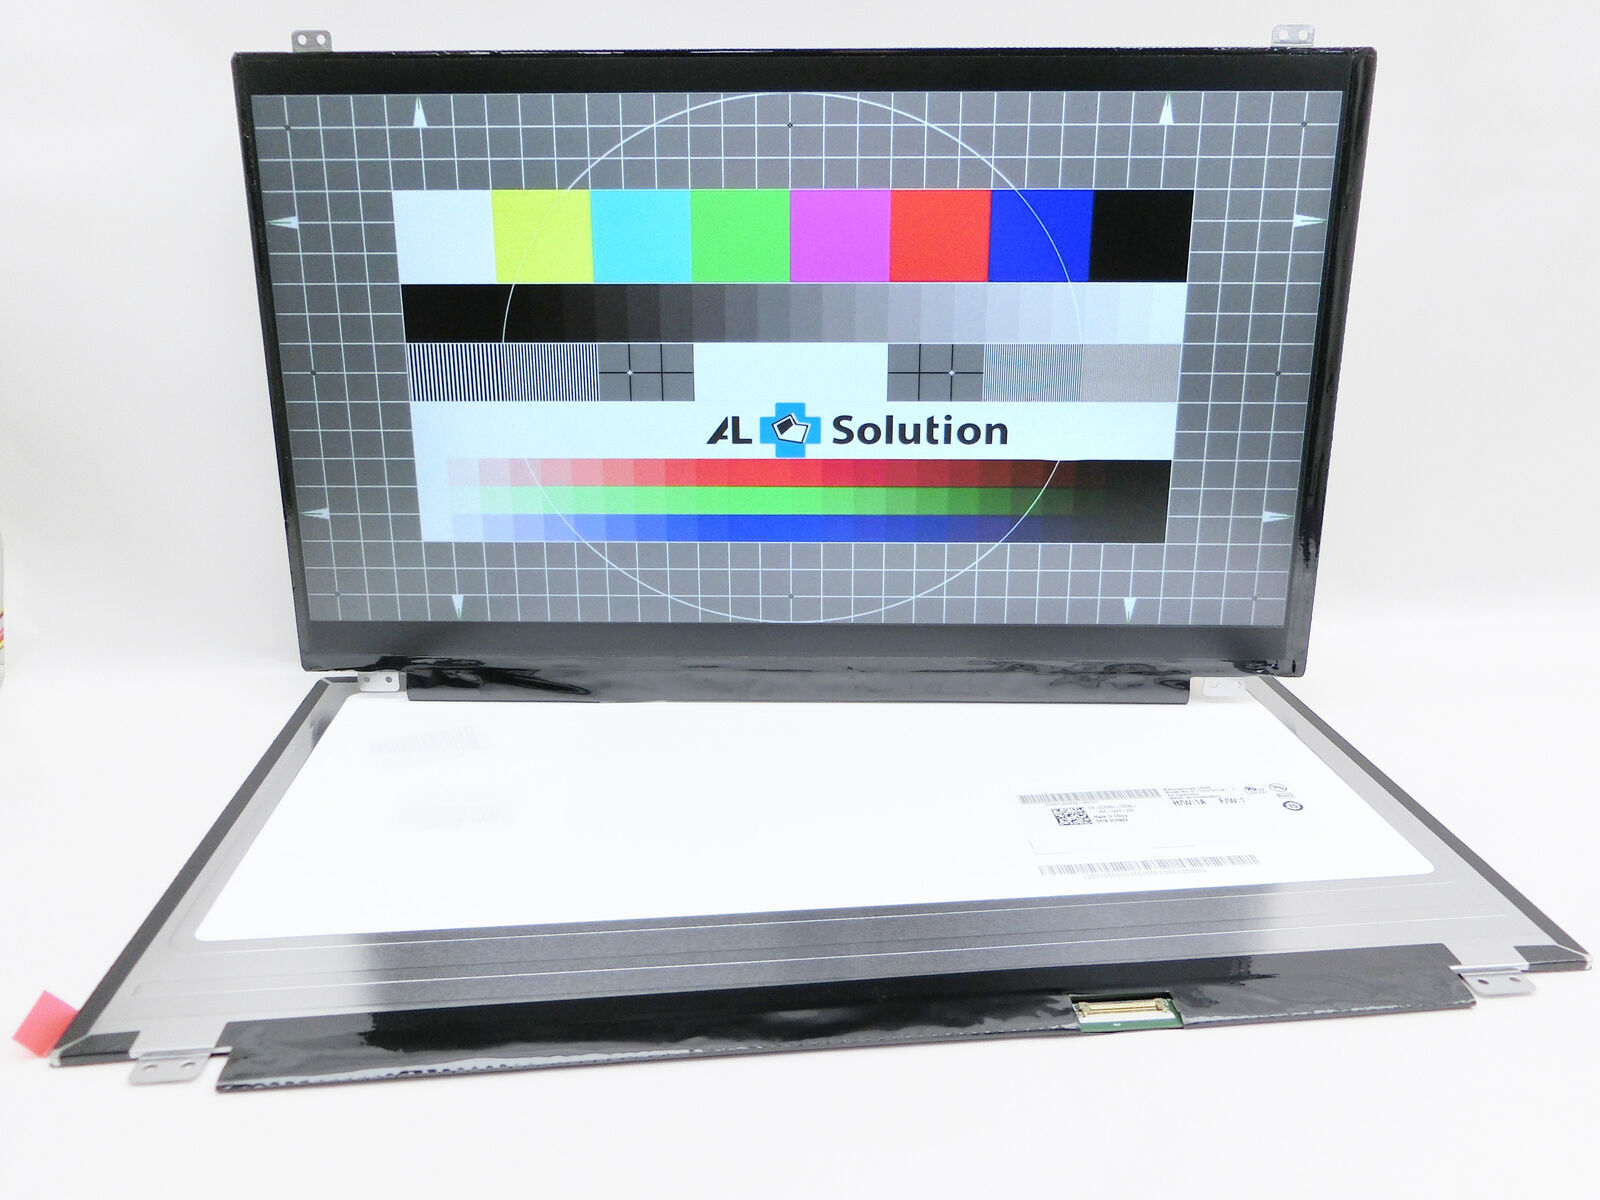 "ASUS VIVOBOOK PRO N552 Display Bildschirm 15,6"" 1920x1080 FHD IPS glänzend"